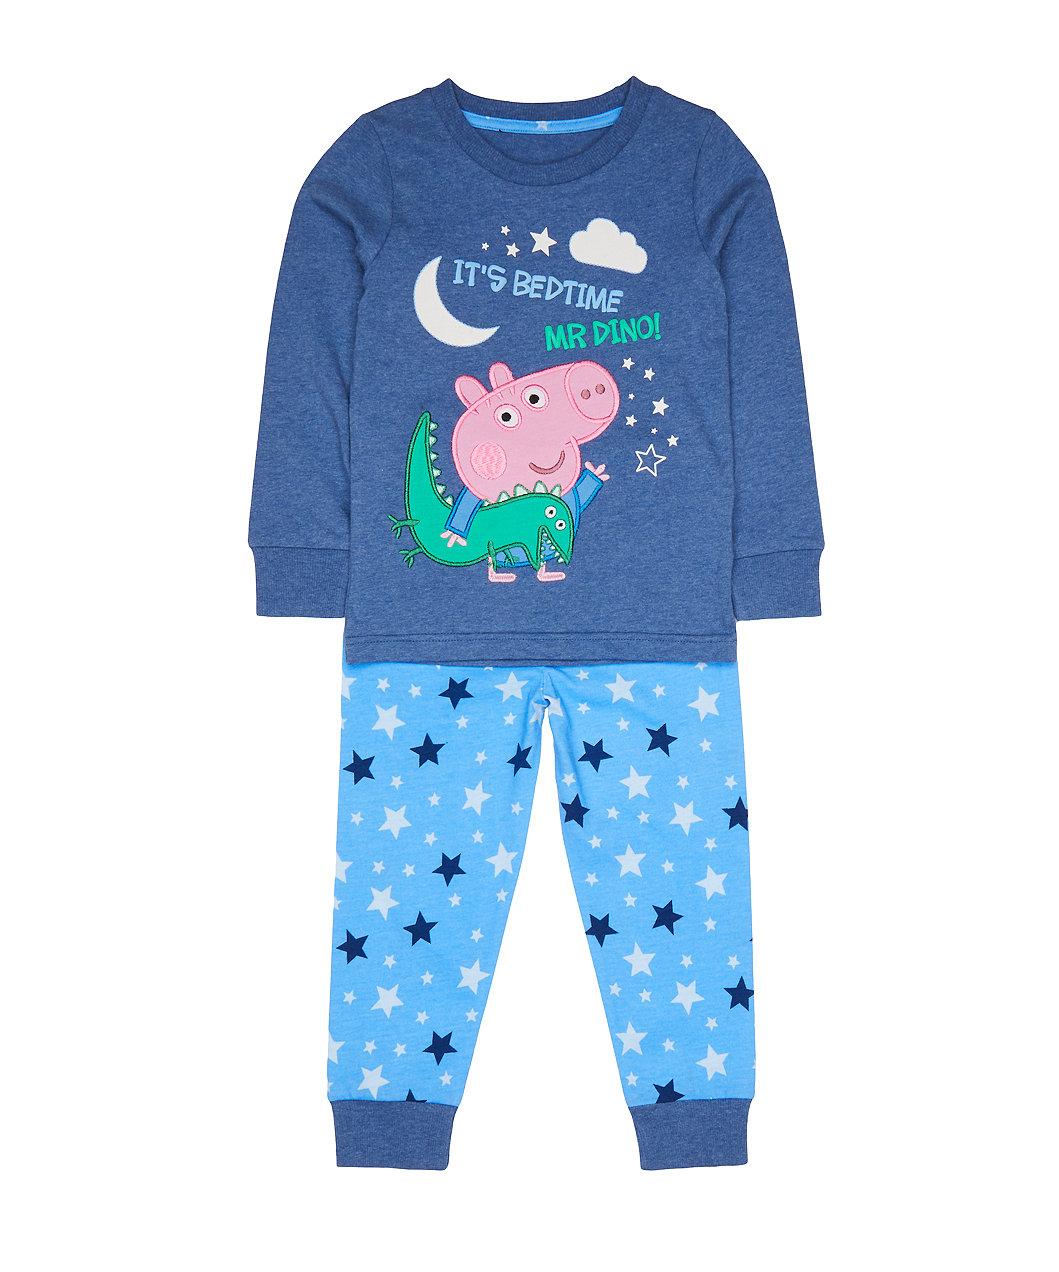 01b4c6ddb318 blue george pig pyjamas